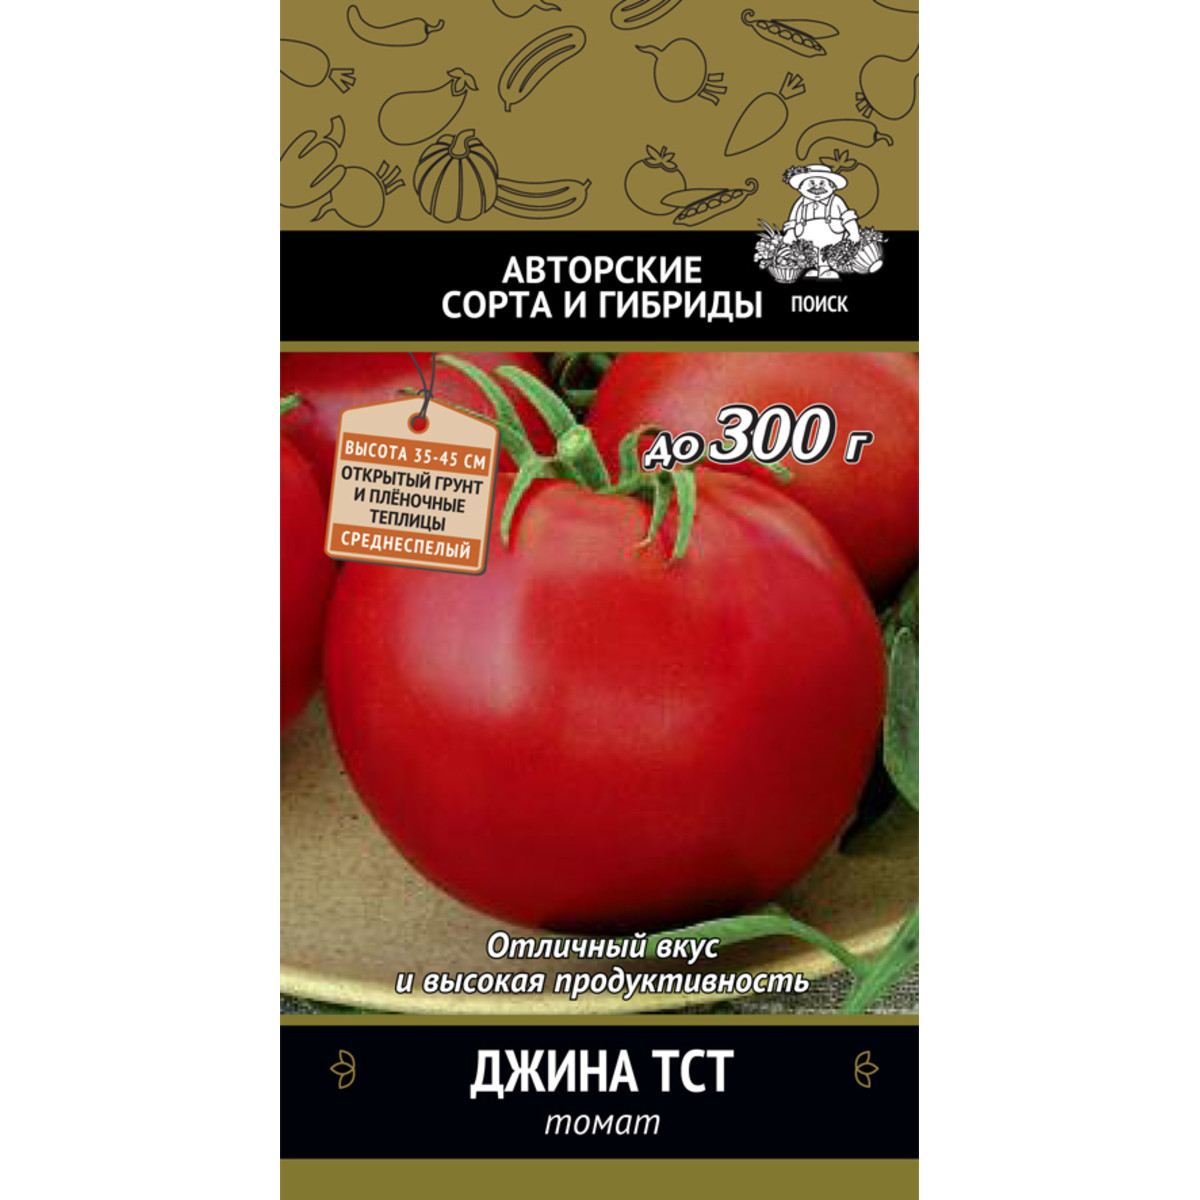 леруа мерлен санкт петербург семена томатов